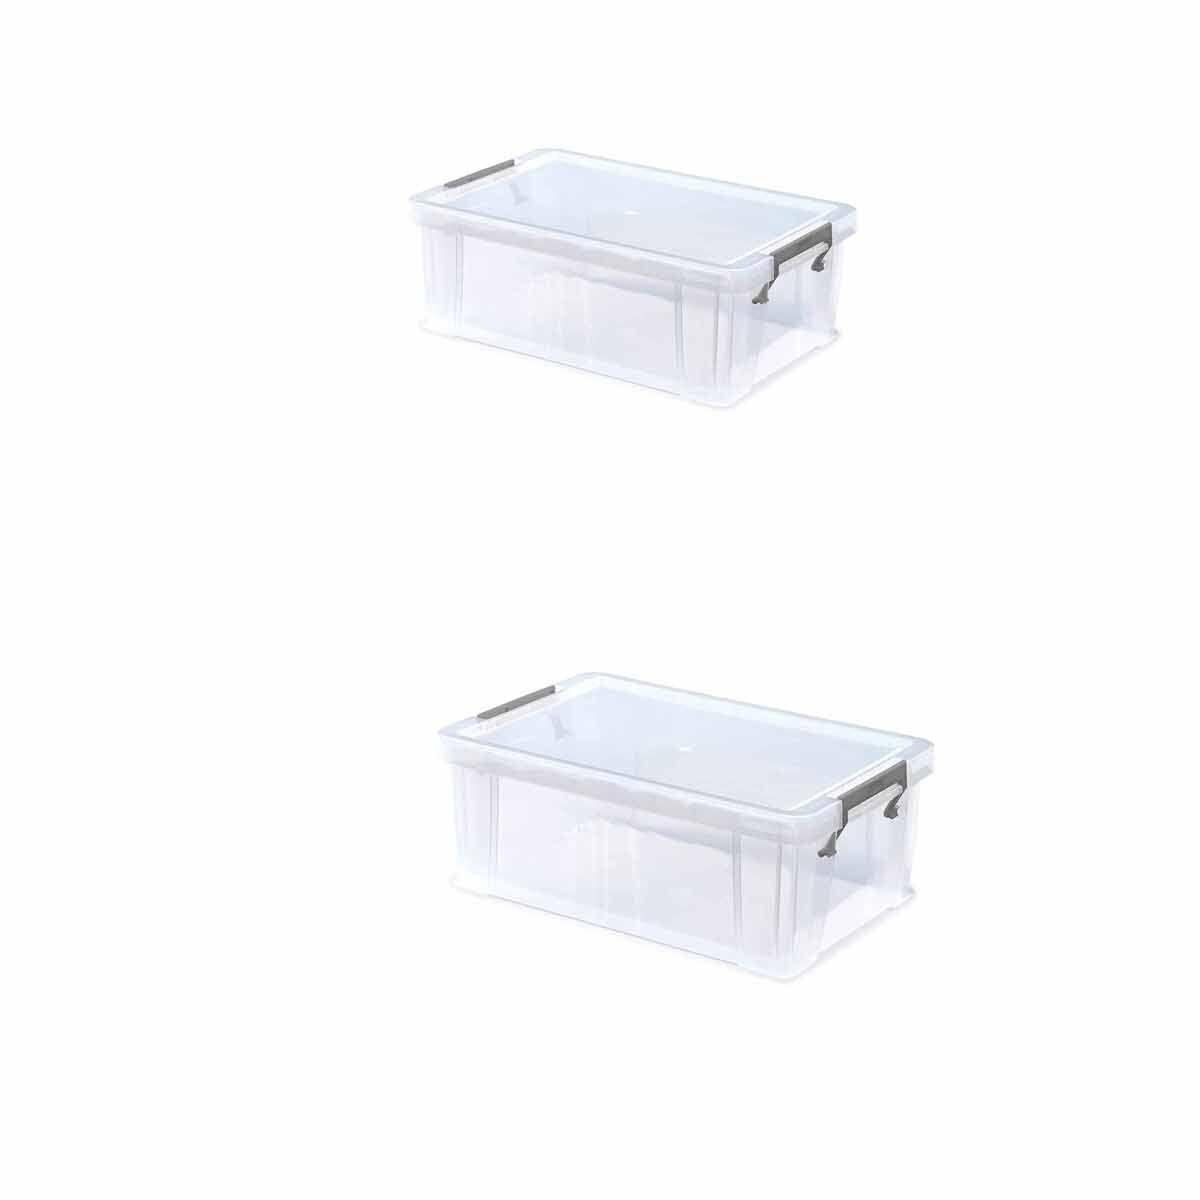 Whitefurze Allstore Plastic Storage Box 10 Litre Pack of 2